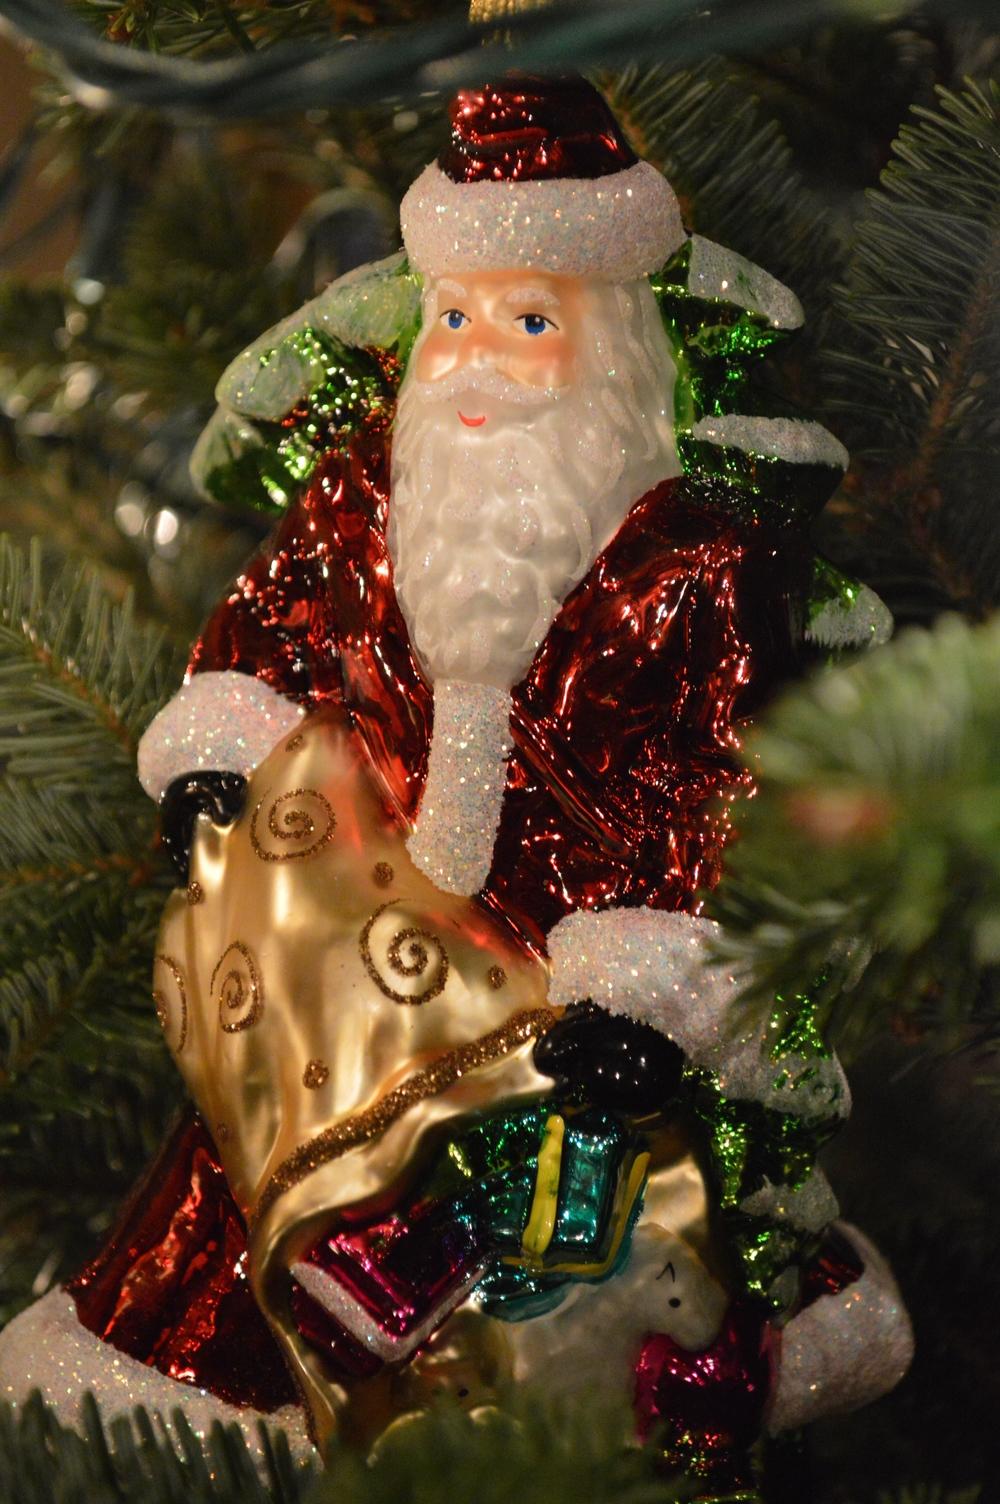 LaurenSchwaiger-Blog-Christmas-Traditions-Santa-Claus-Ornament.jpg